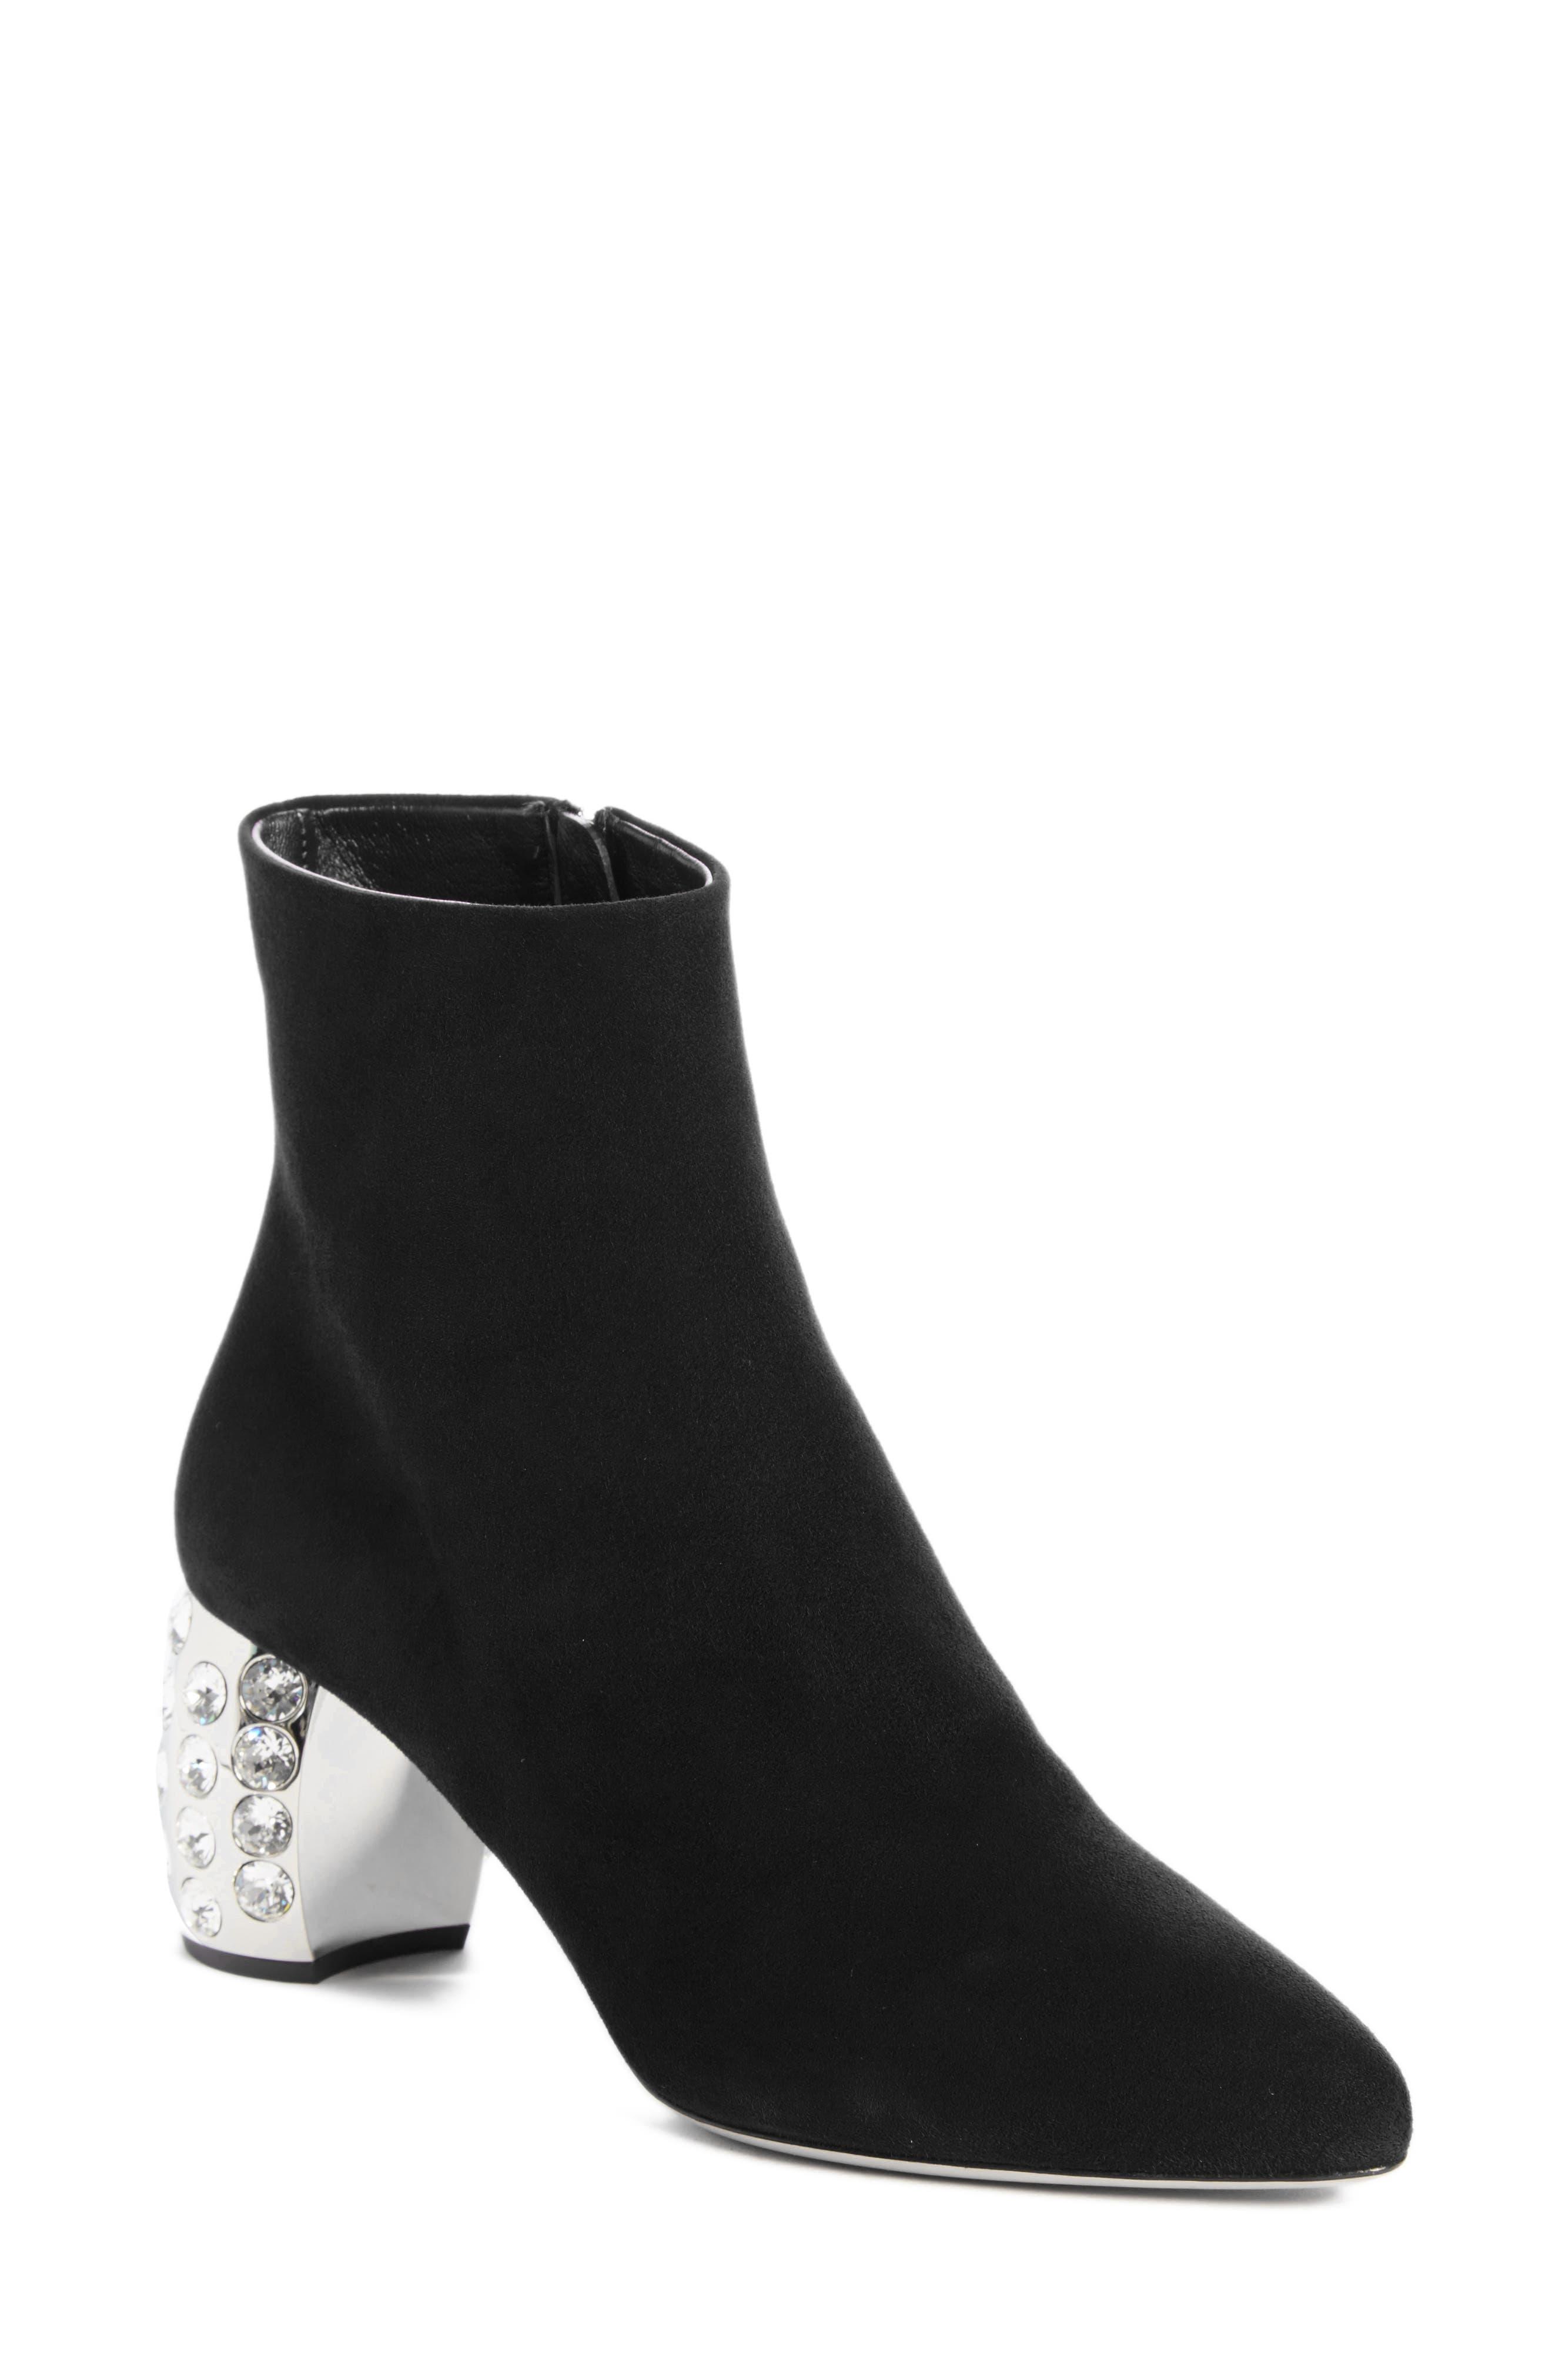 Miu Miu Embellished Block Heel Boot (Women)